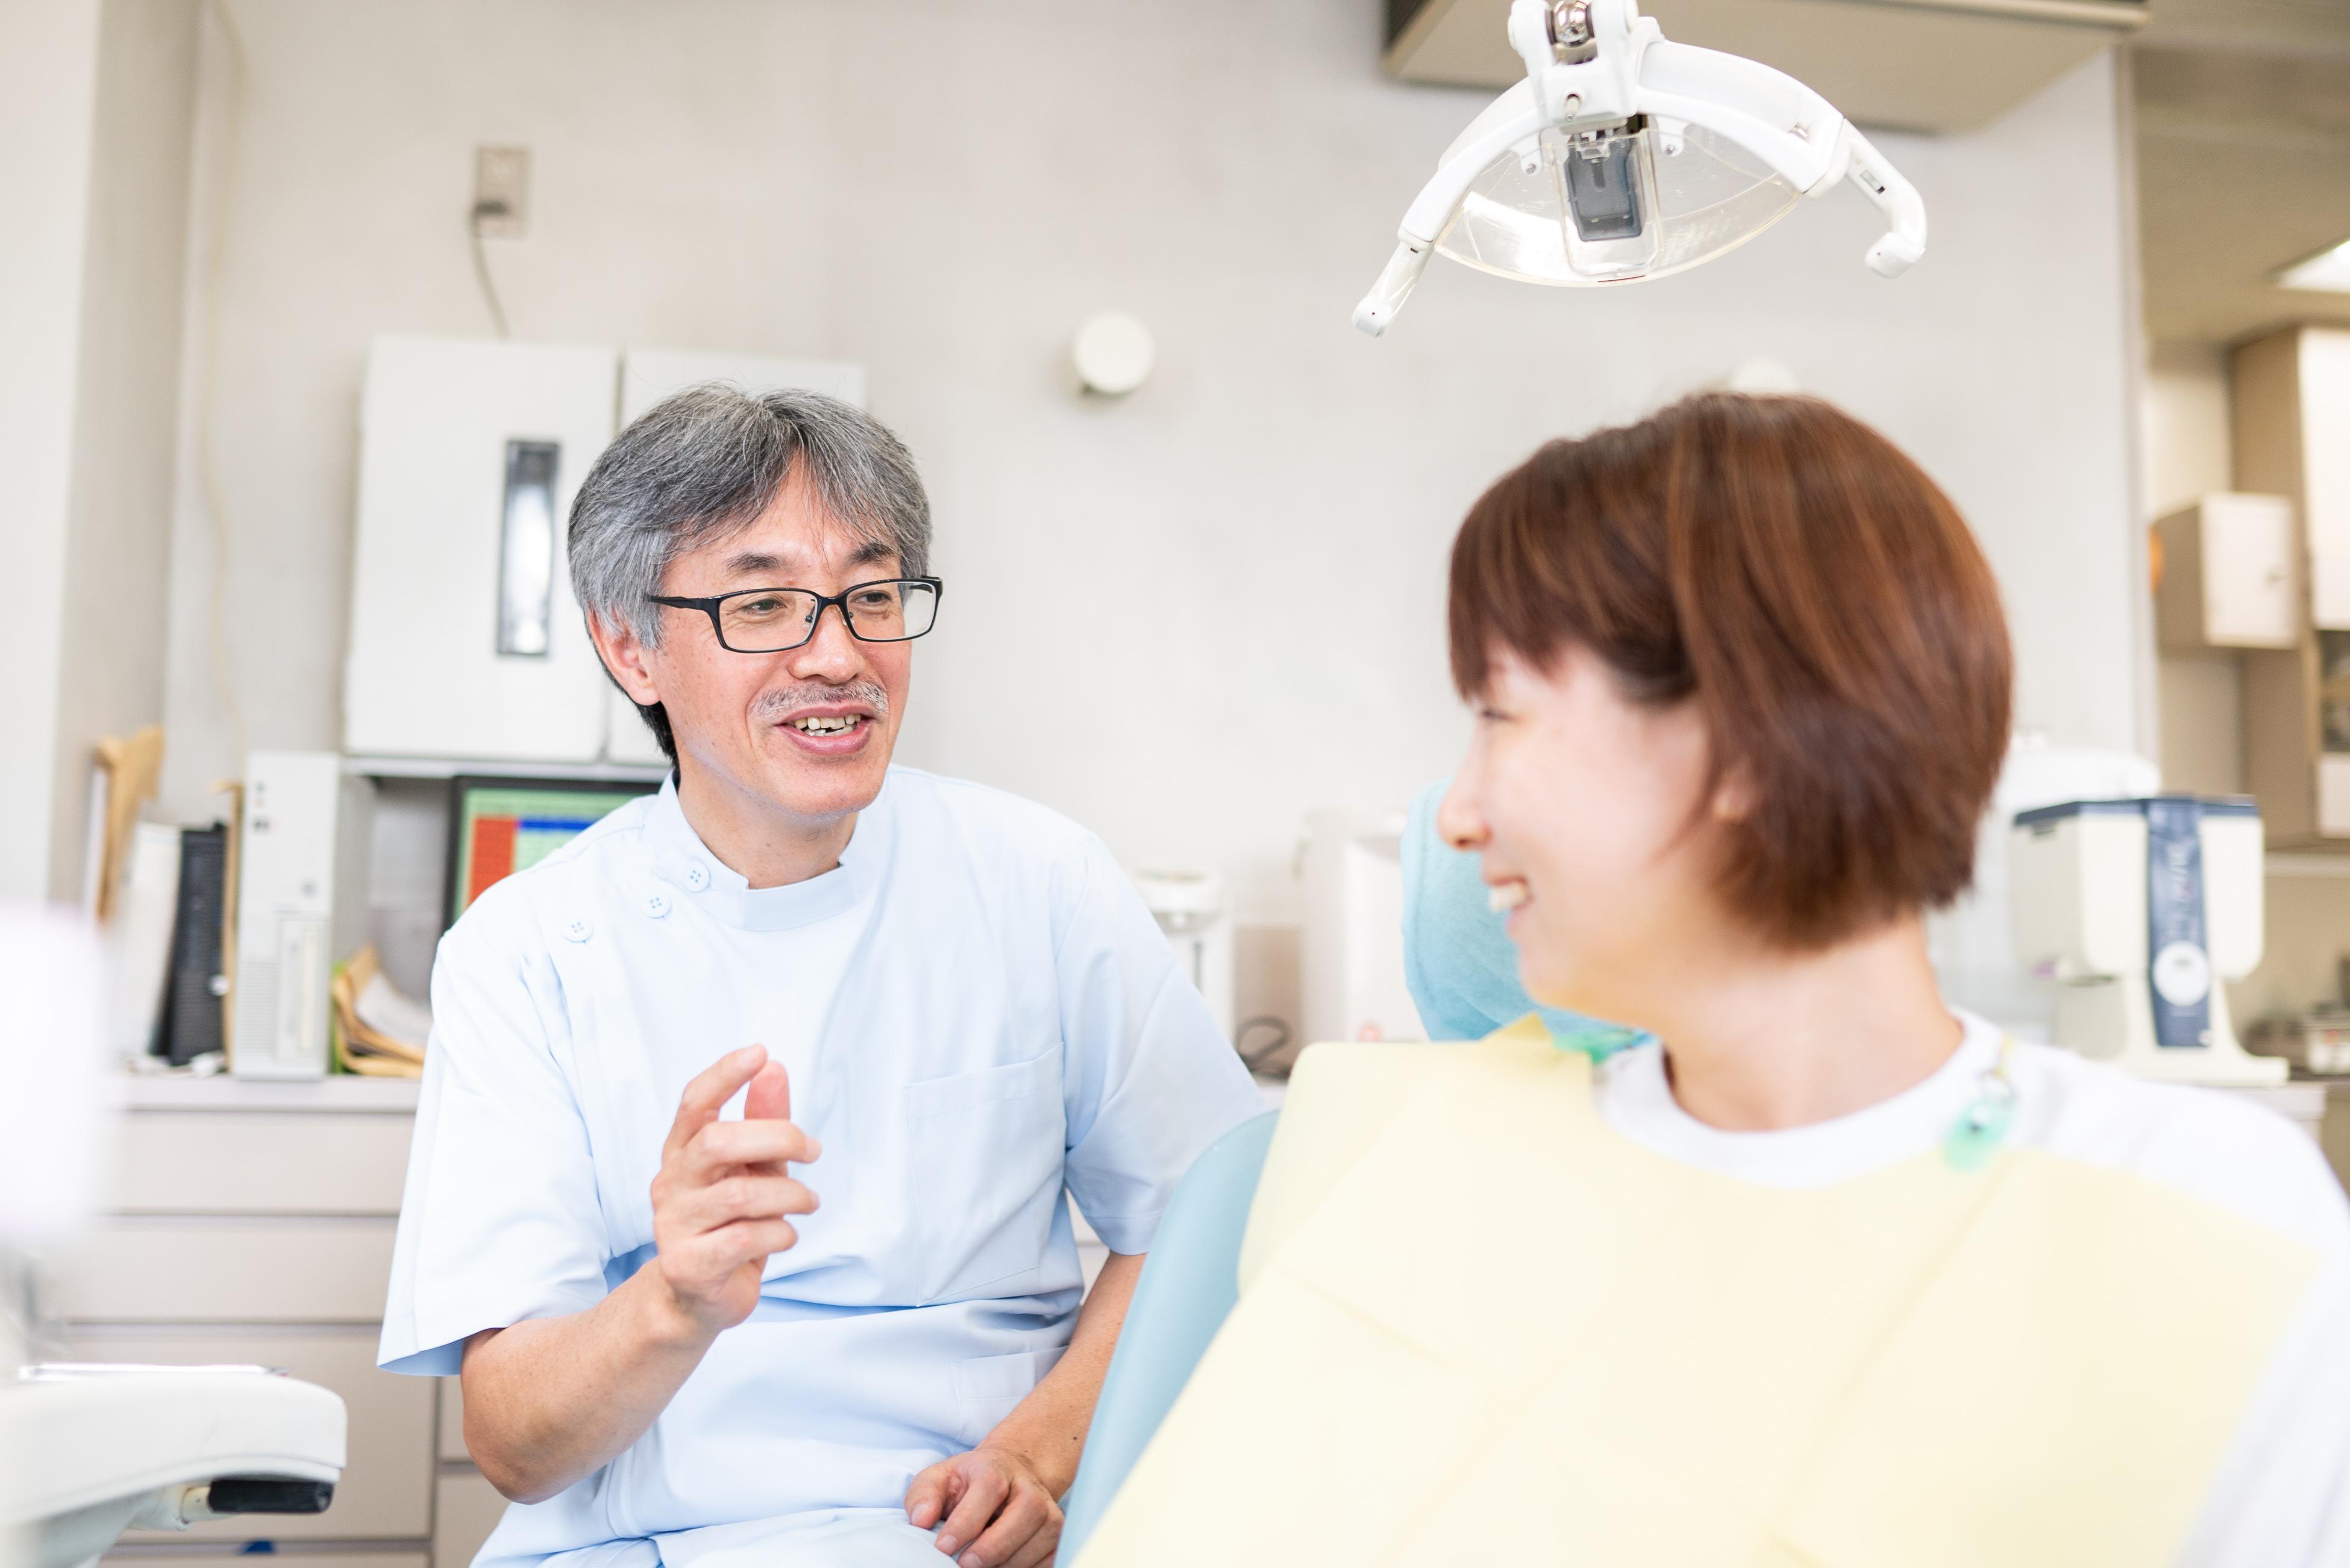 入れ歯治療|相馬市の菅野歯科医院